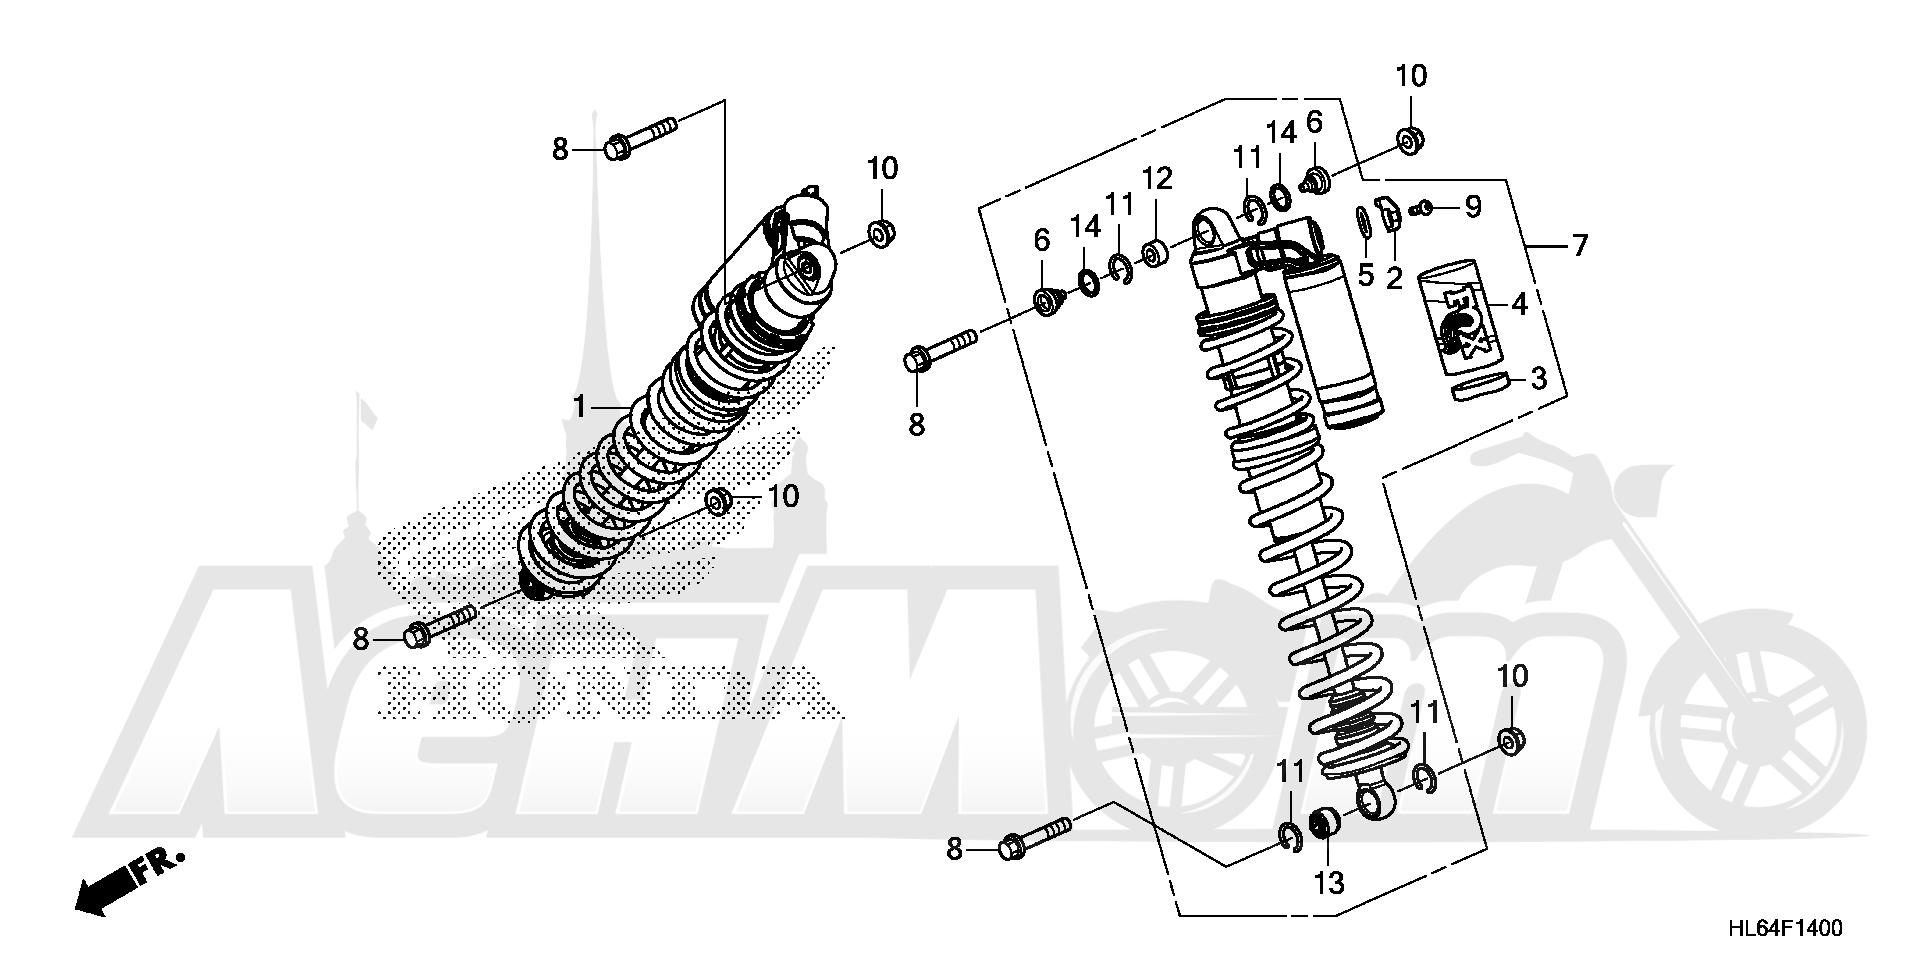 Запчасти для Квадроцикла Honda 2019 SXS1000S2R Раздел: FRONT CUSHION (1) | перед подкладка (1)